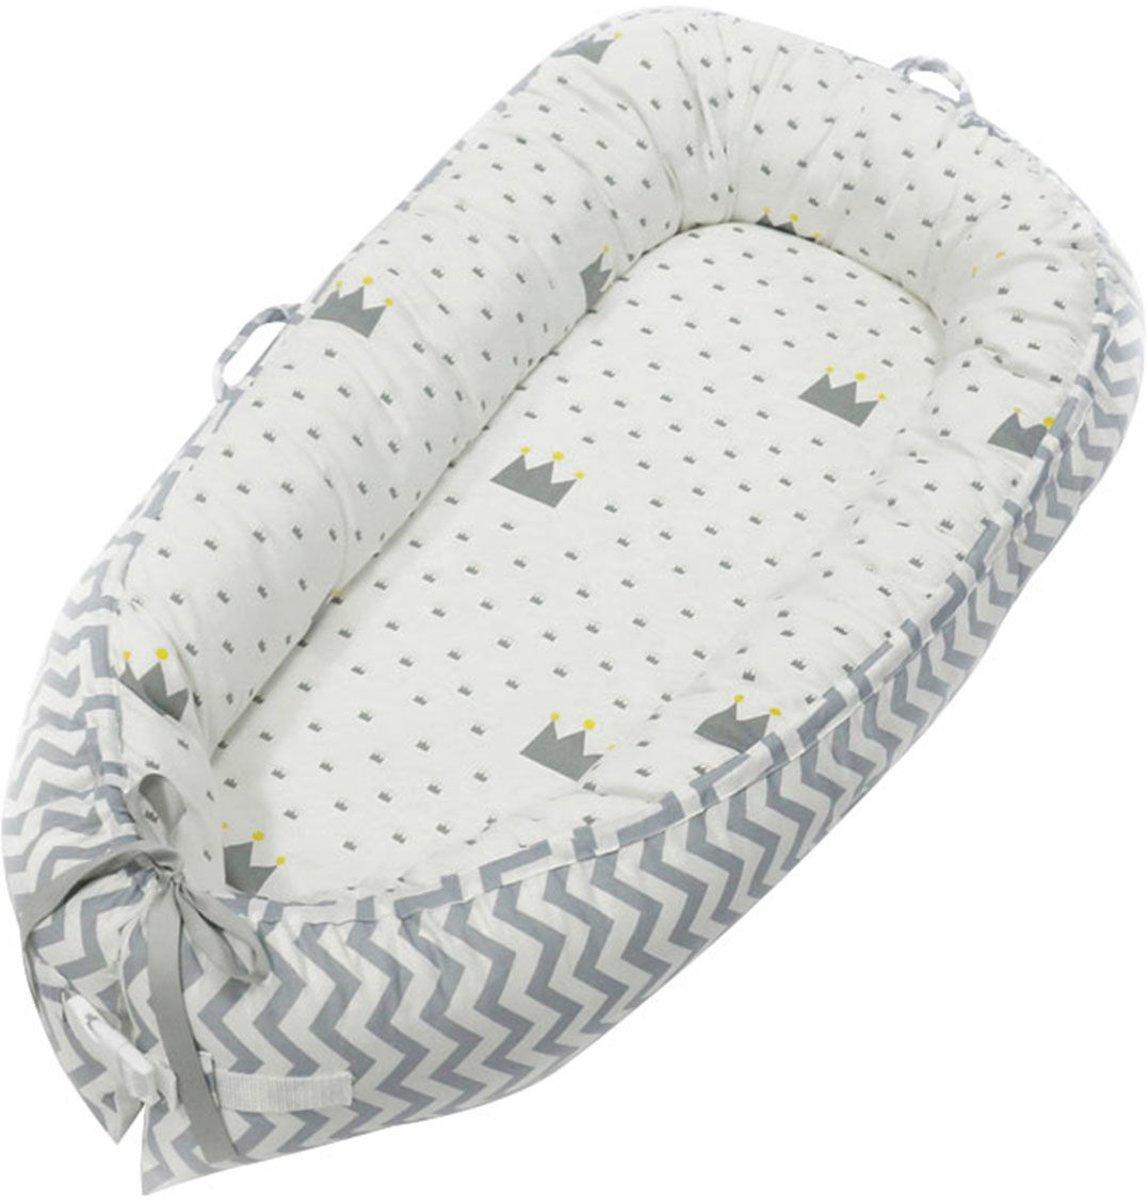 Little World Babynest Sleepy White